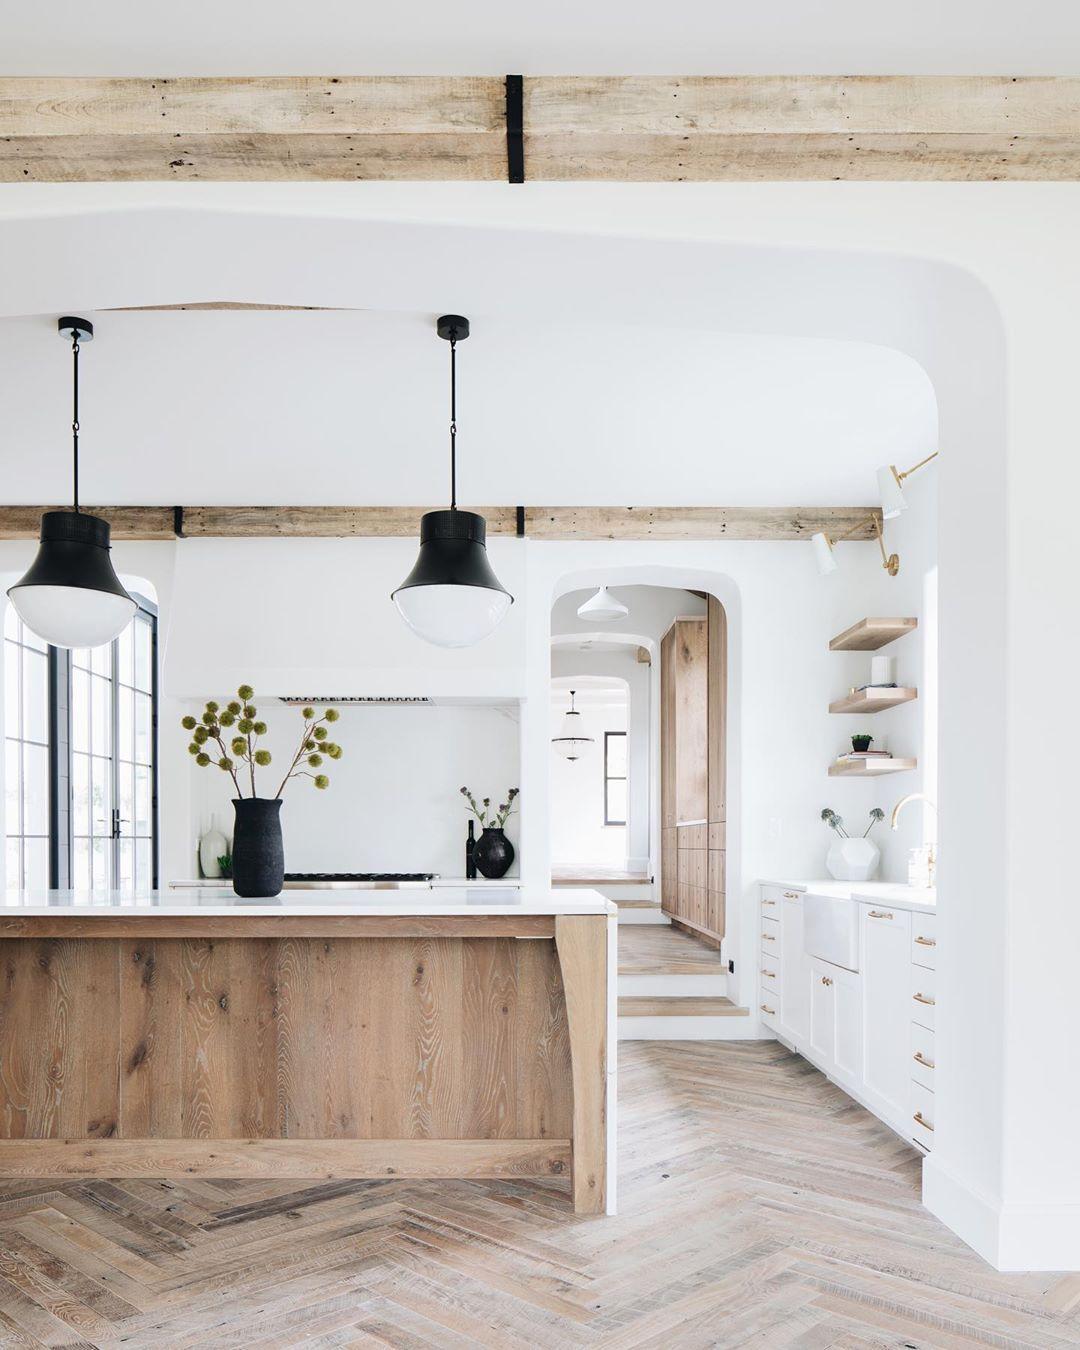 9 Ways to Work a Wood Island in a White Kitchen